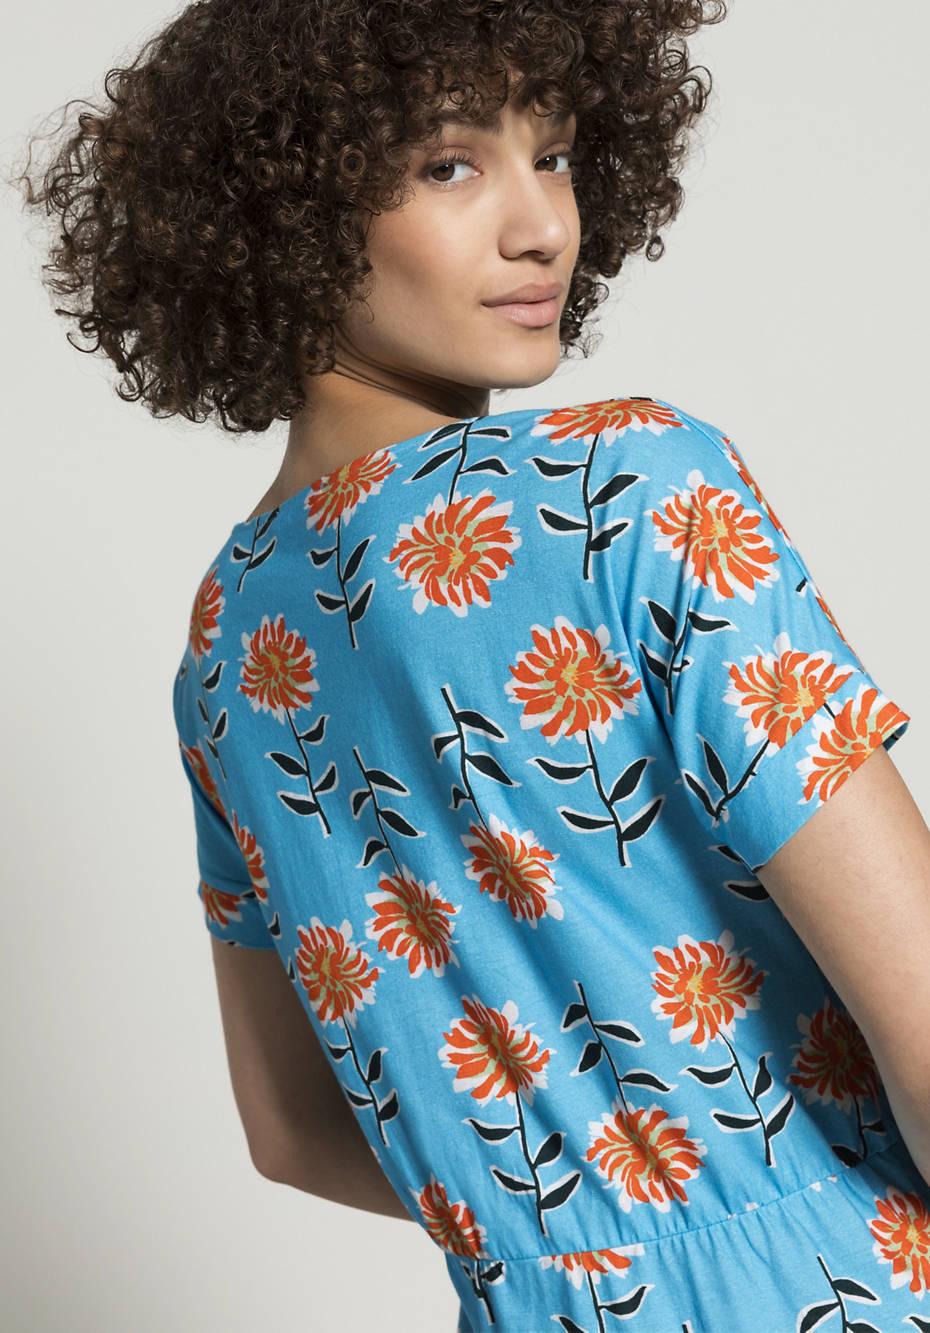 Dress made of pure organic cotton